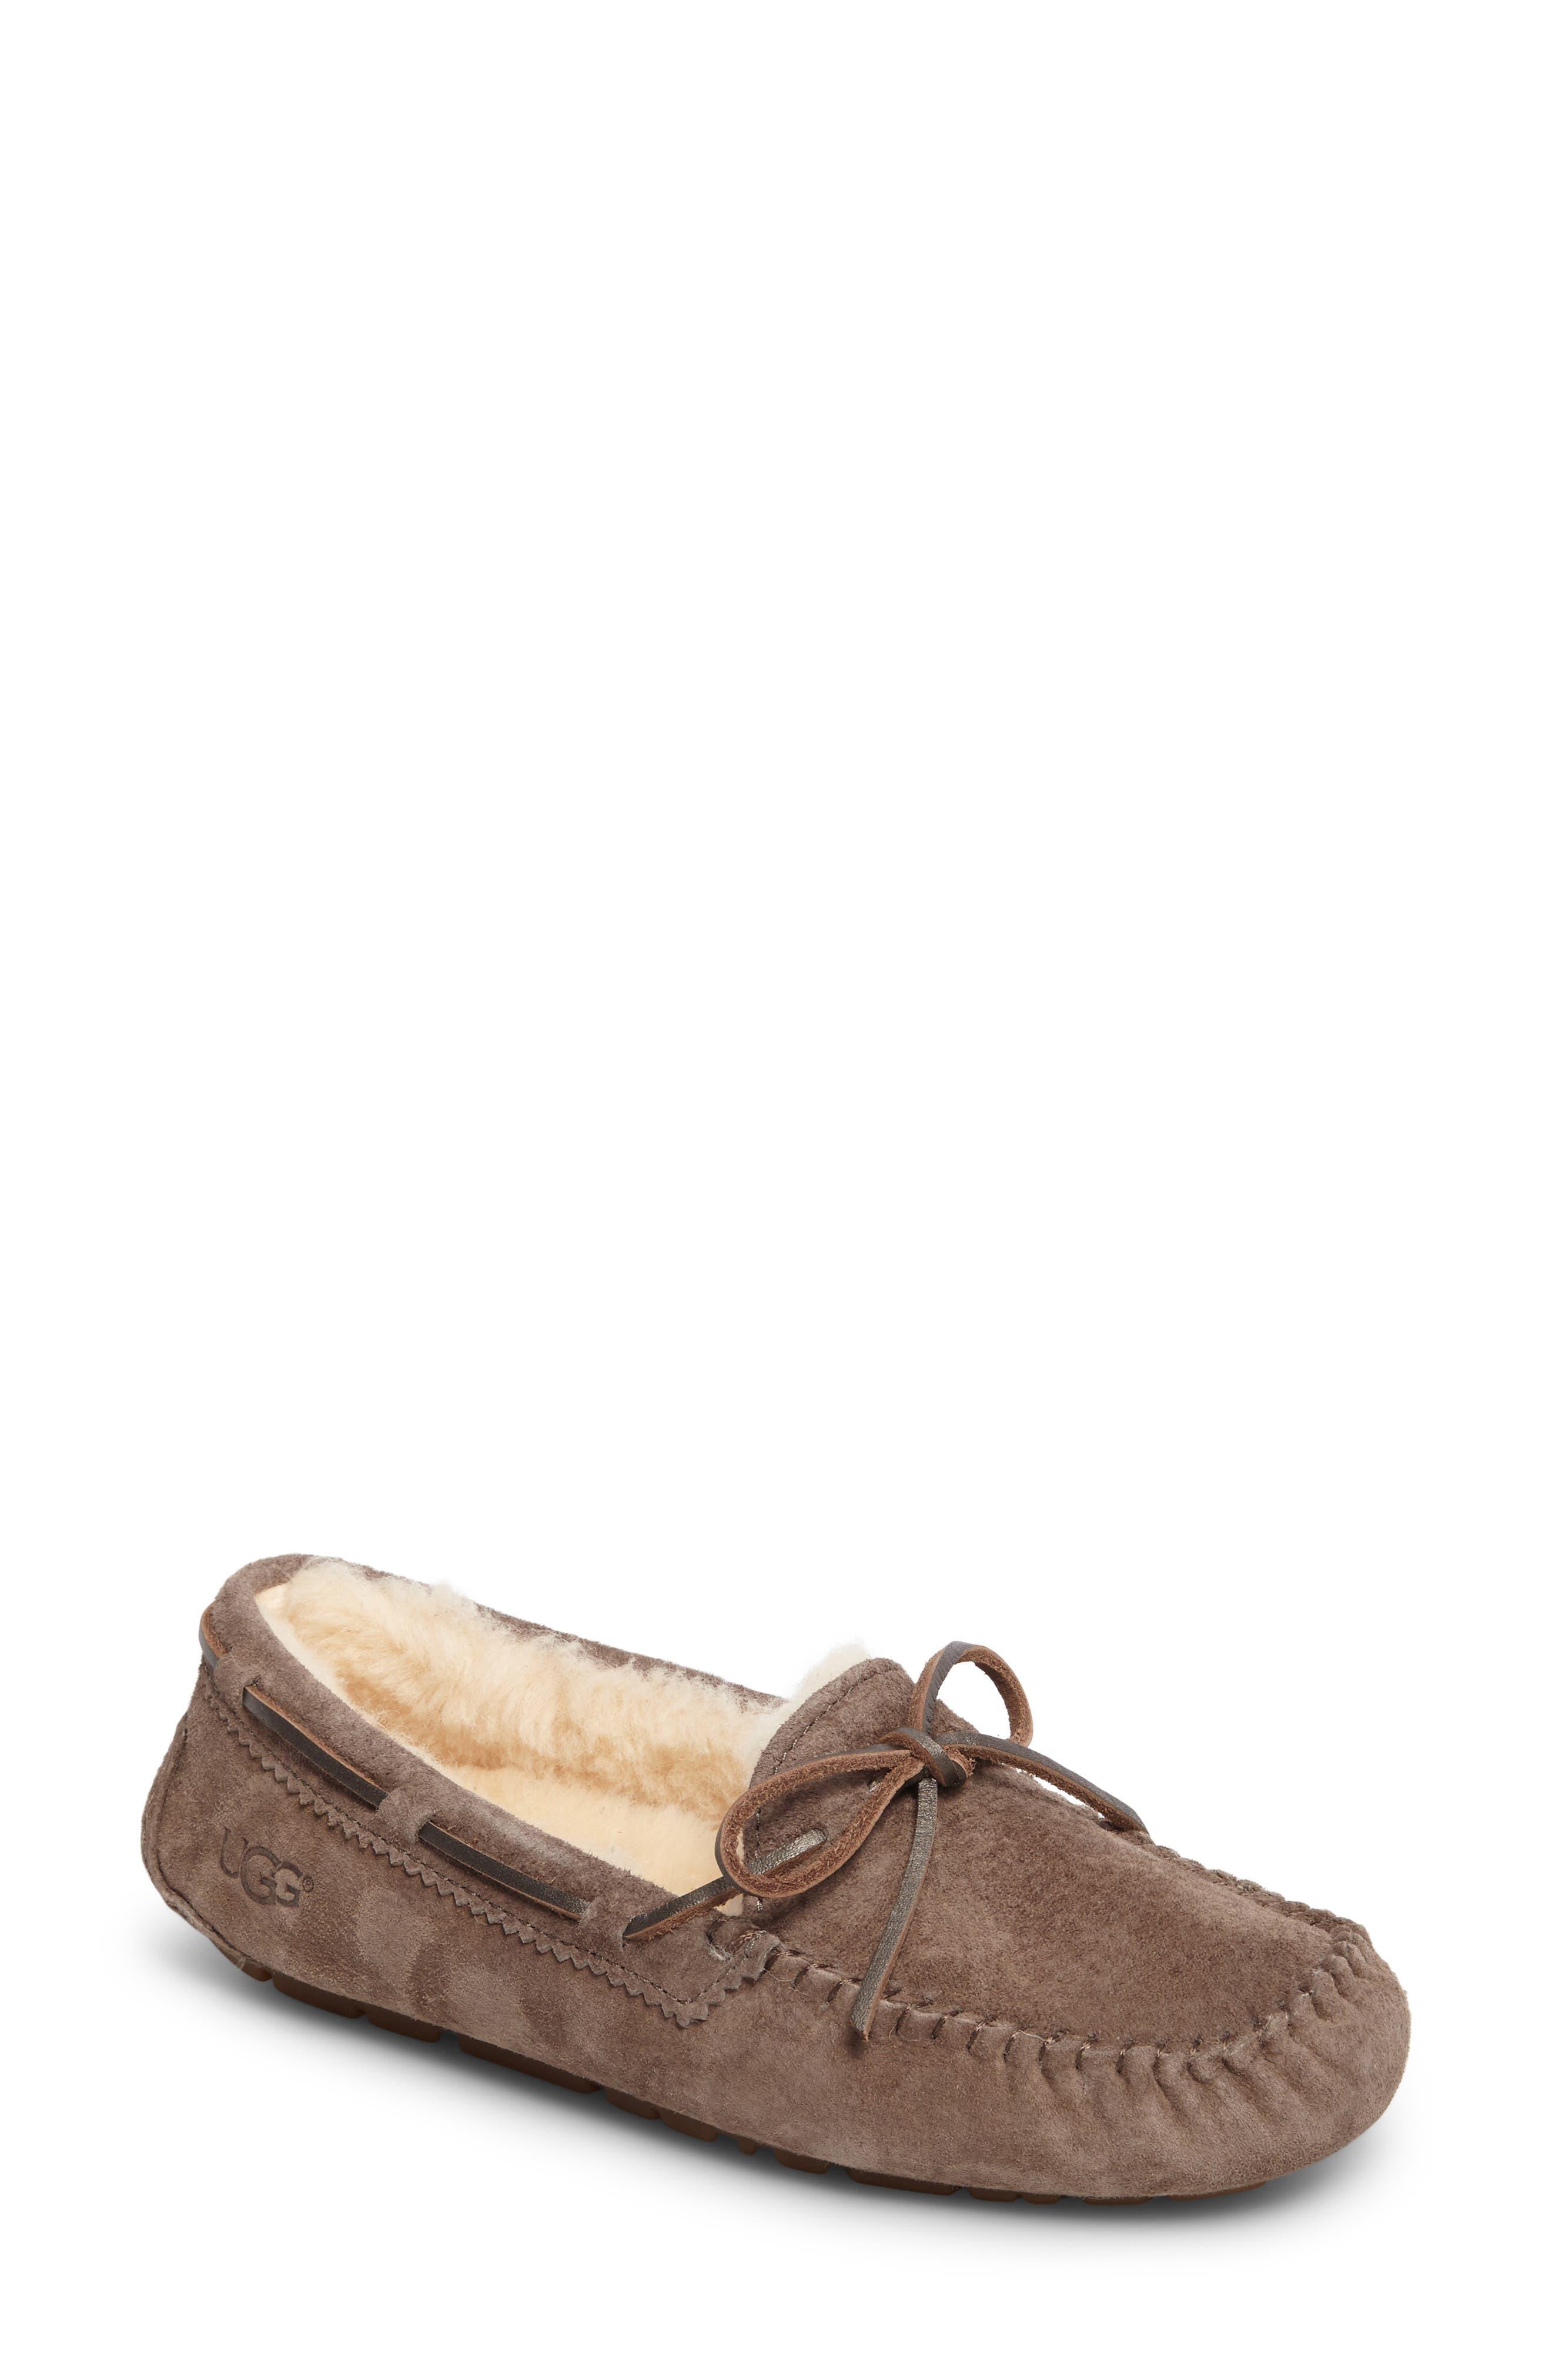 ugg slippers nordstrom